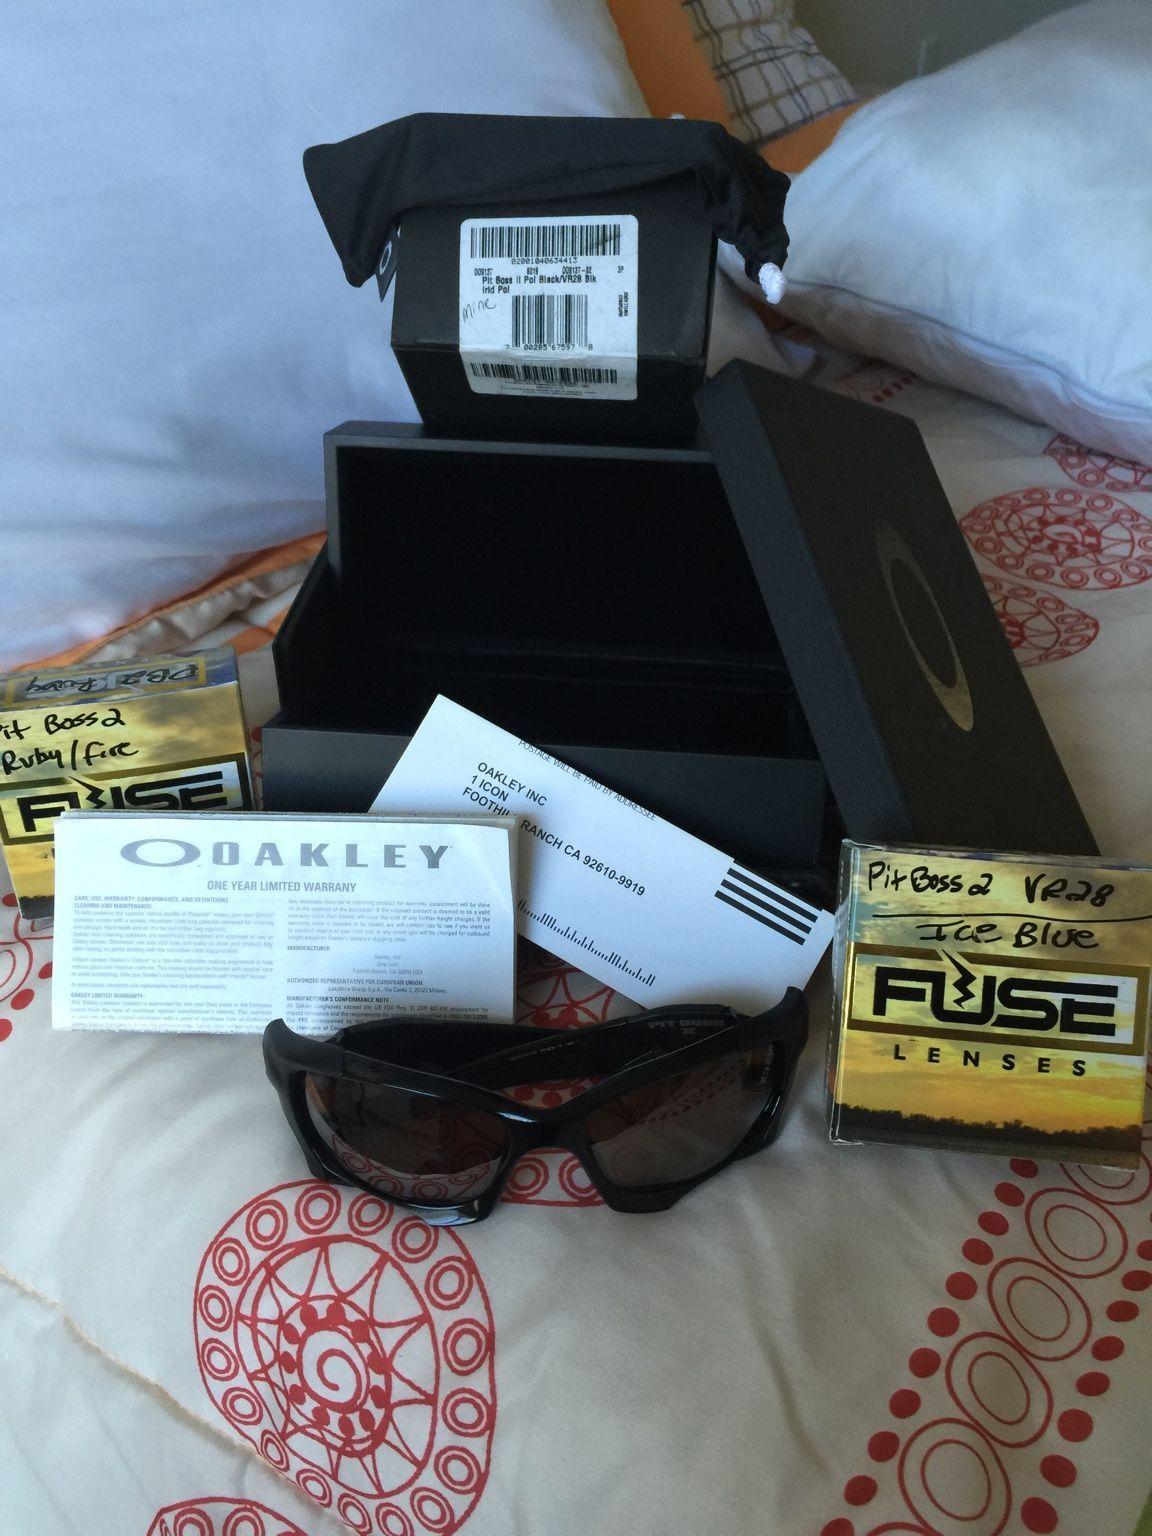 ***GONE*** Polished black PBII with extra lenses - 1ce16cf62f80039177709b40605d81ea.jpg